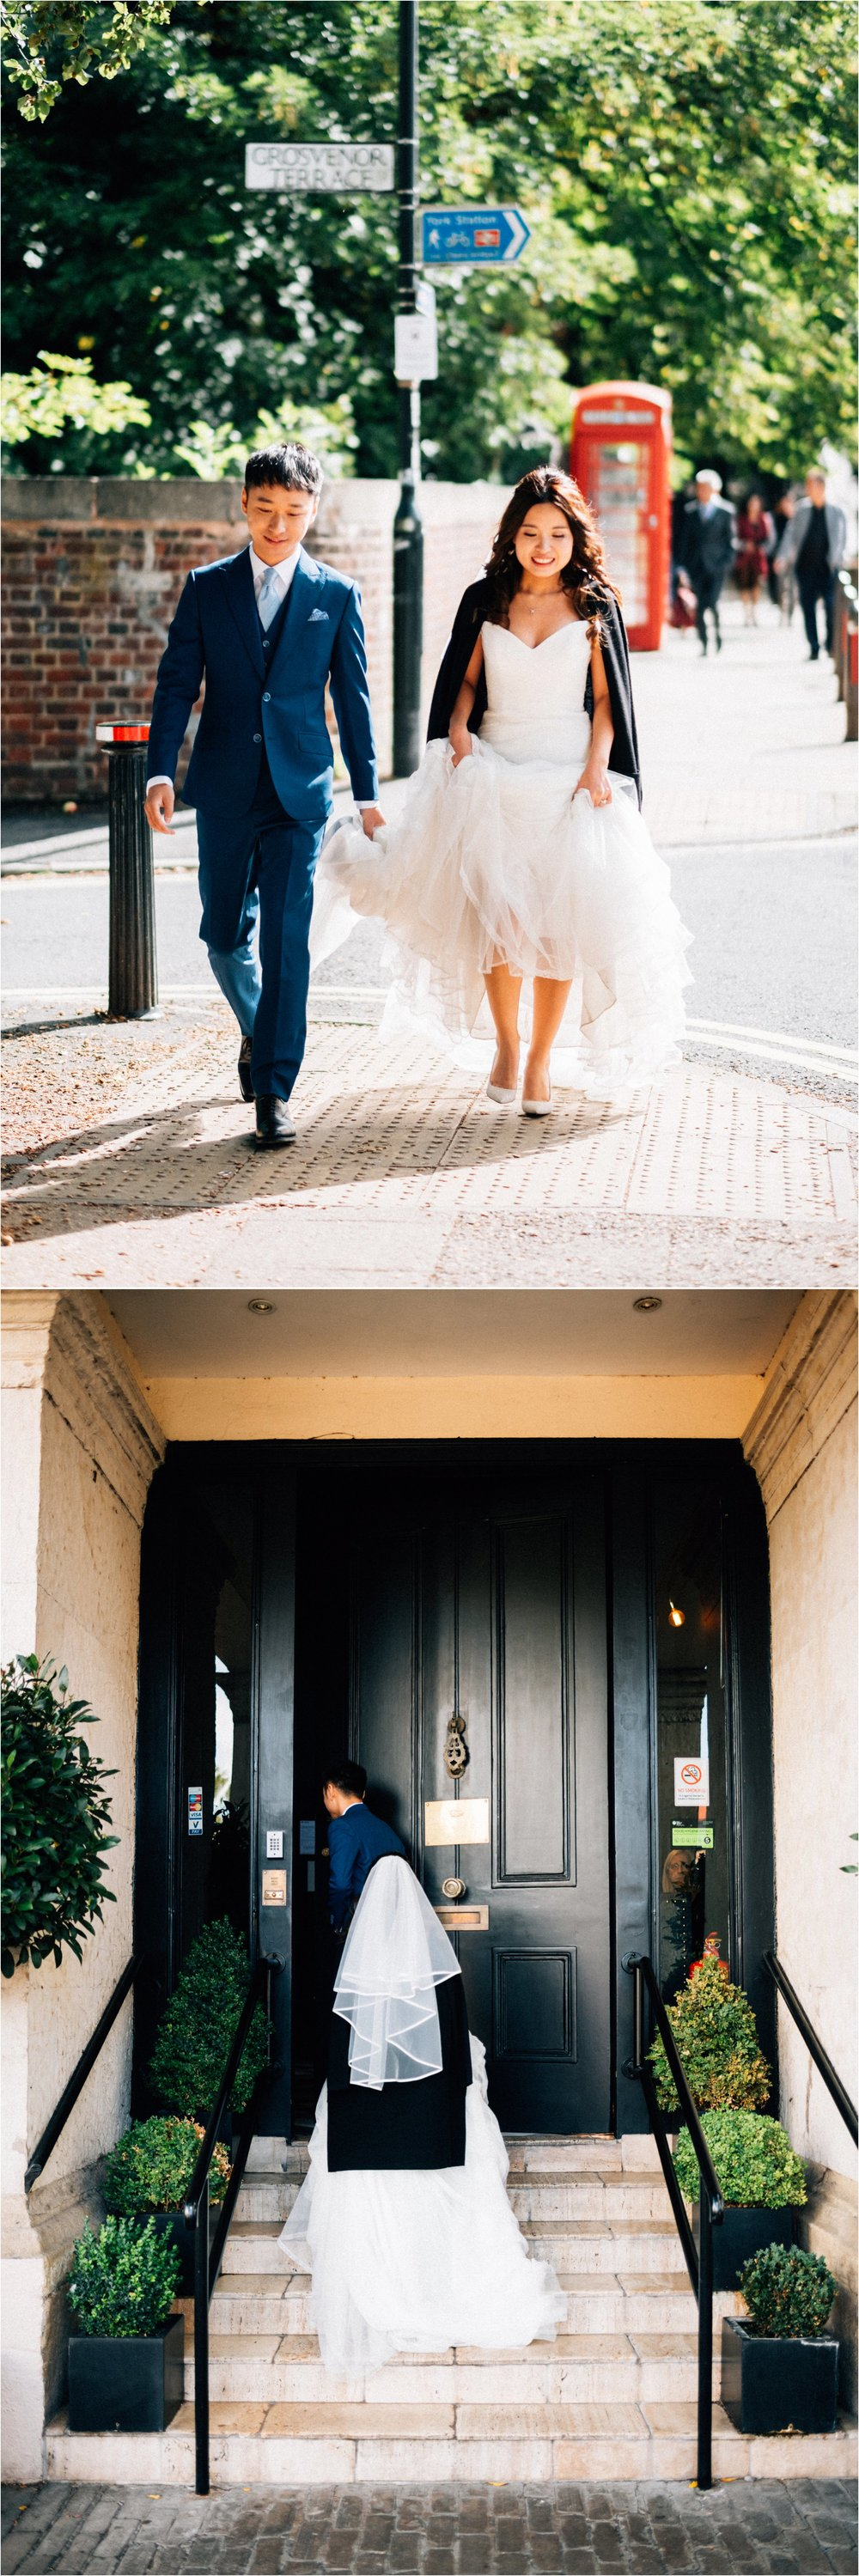 York city elopement wedding photographer_0155.jpg